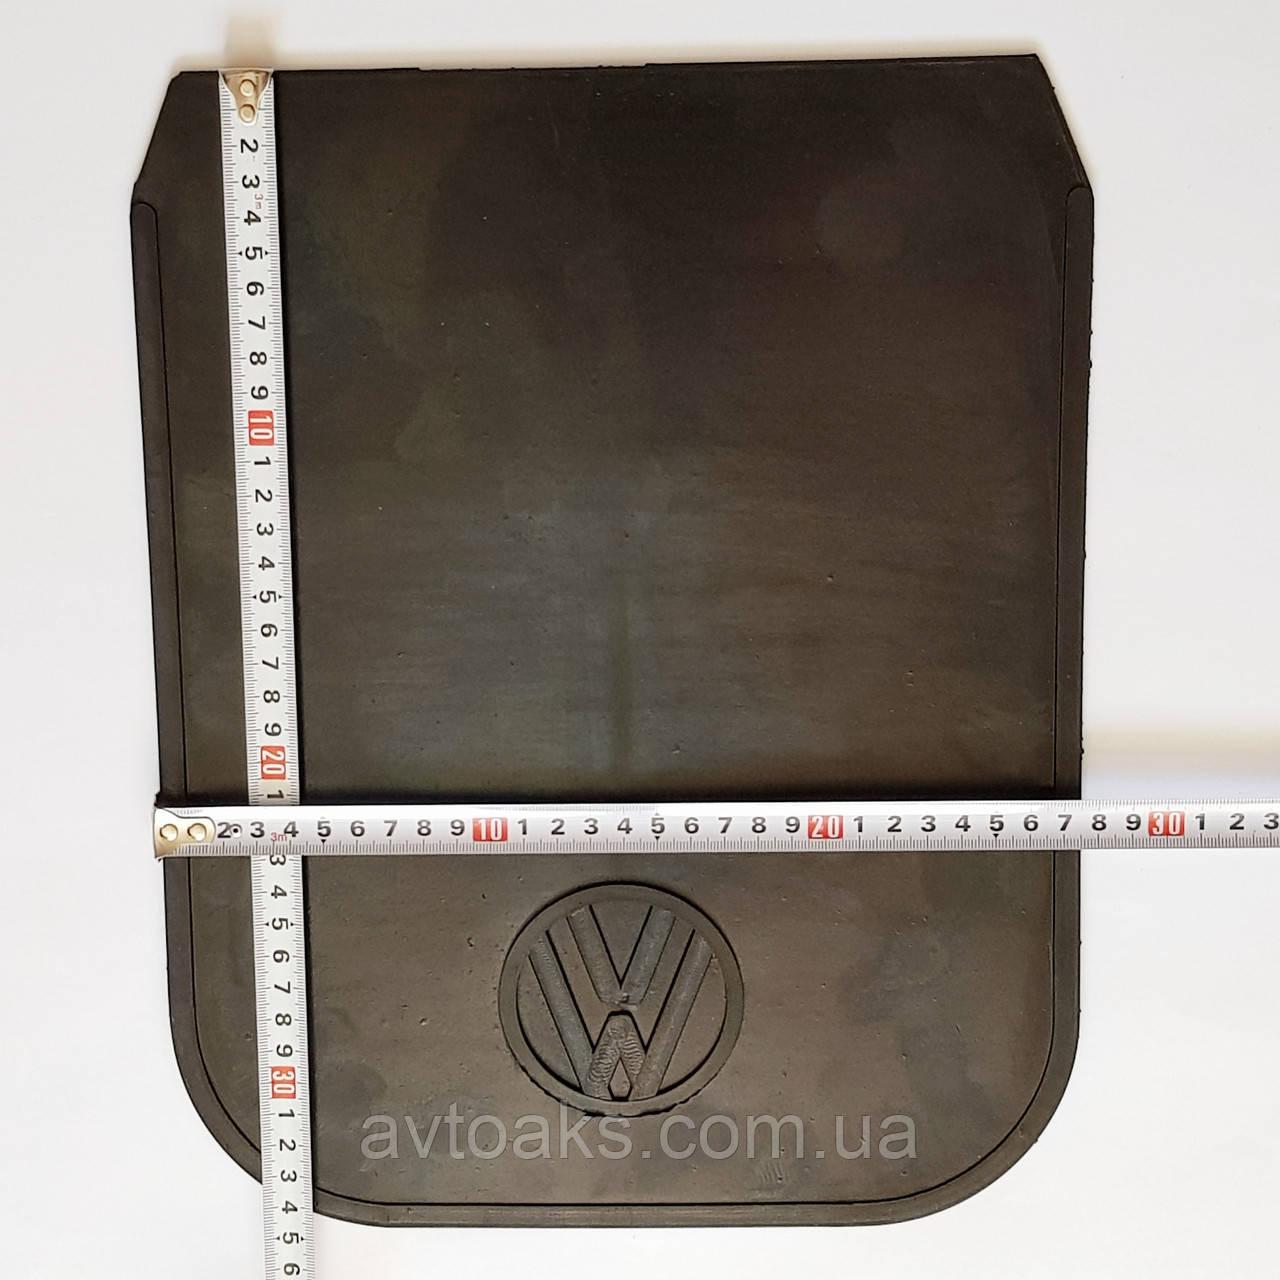 "Брызговик резиновый, с эмблемой ""W"" 34х28 см"